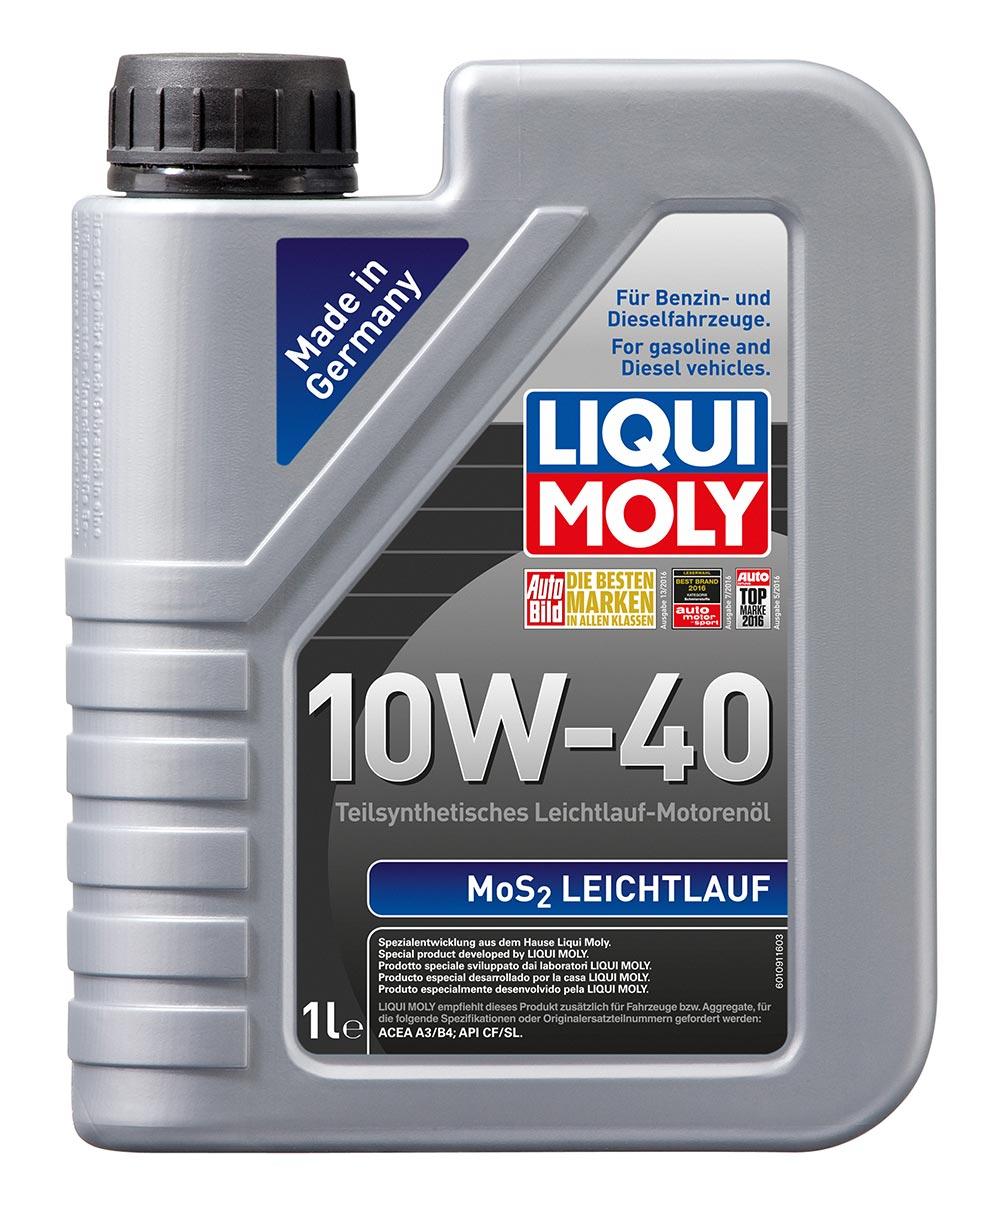 Масло моторное синт.10W-40 MoS2 Leichtlauf 1л ACEA A3 ACEA B4 API SL